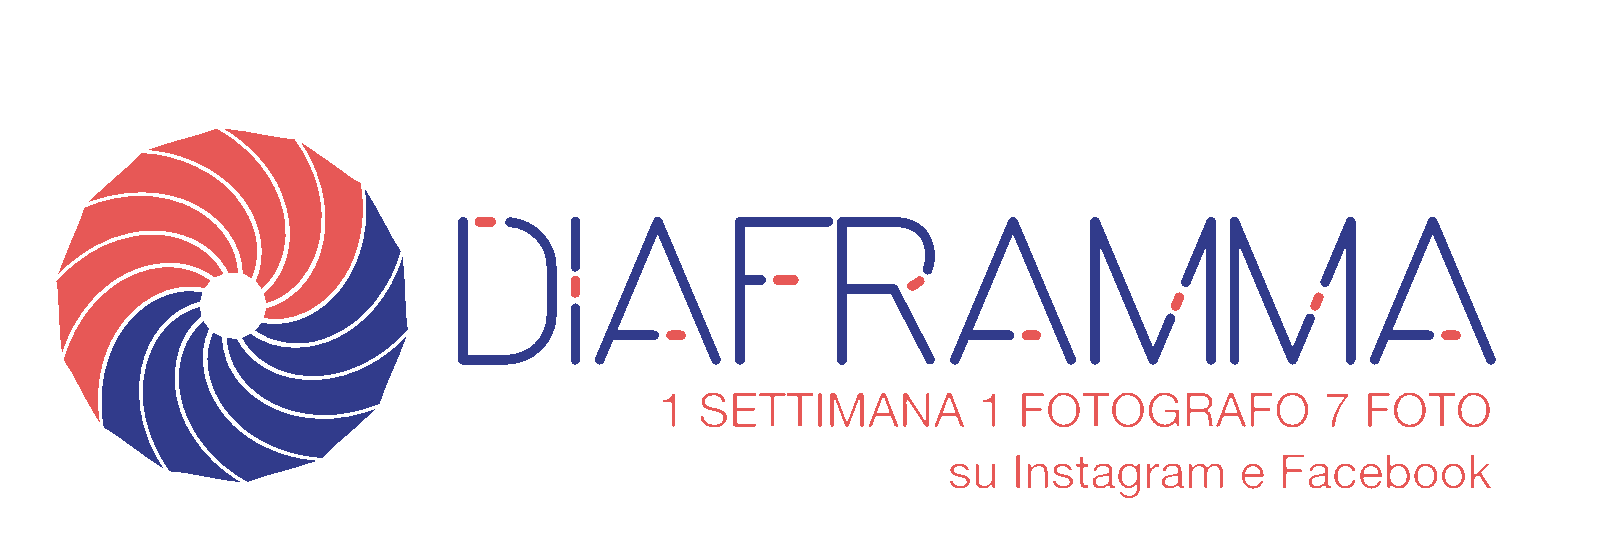 diaframma-titlecard-new